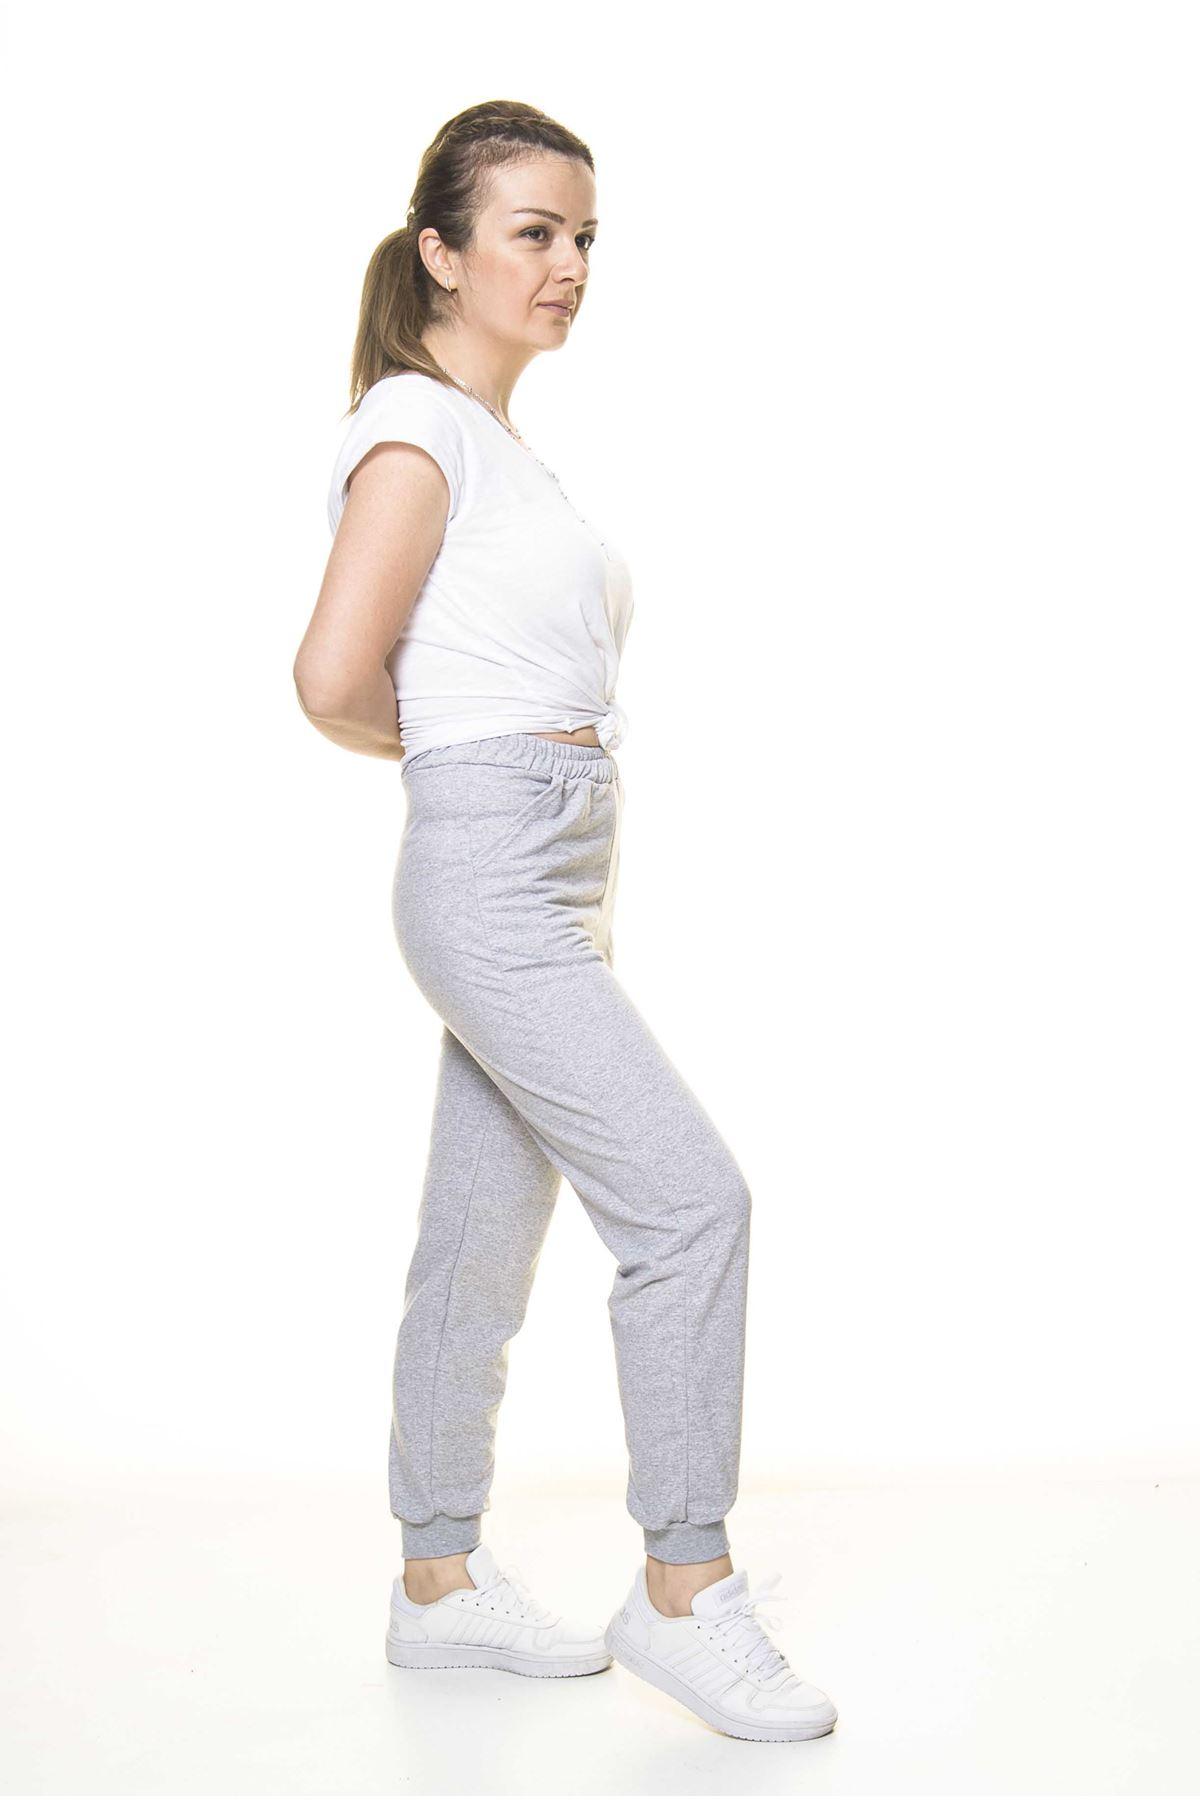 Kadın Gri Lastikli Paça  Eşofman Altı 5D-3072